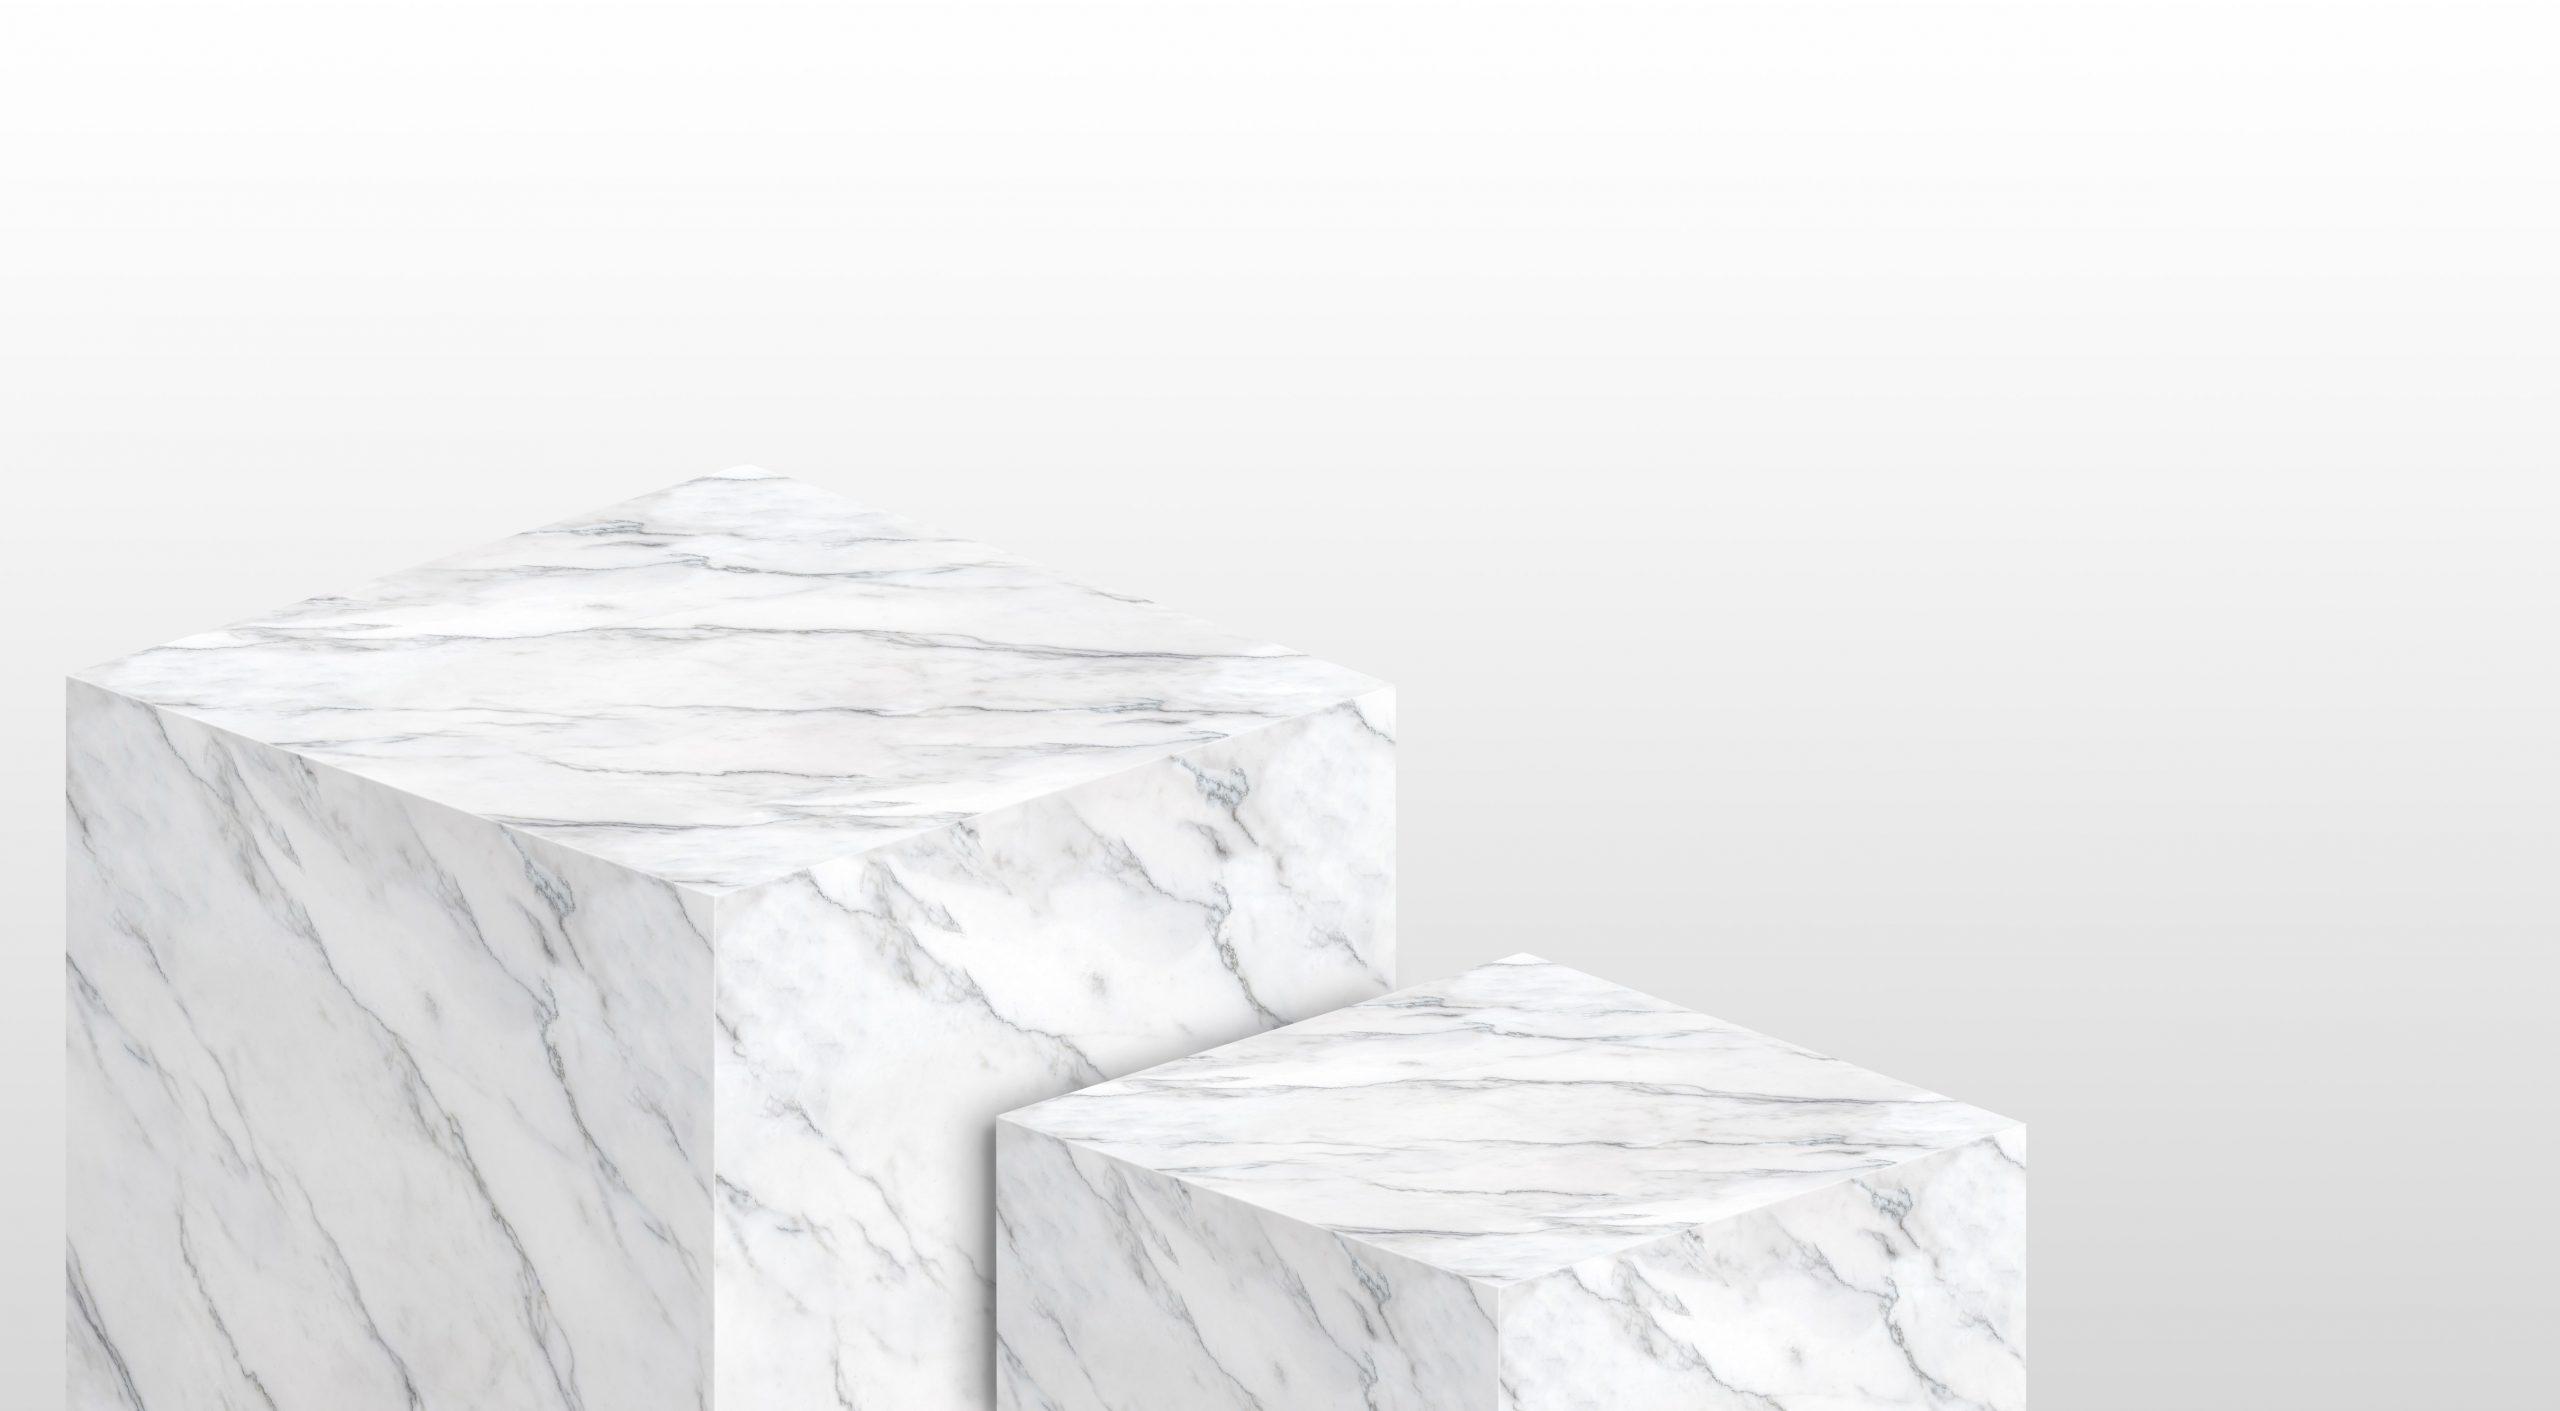 bloques de mármol blanco carrara